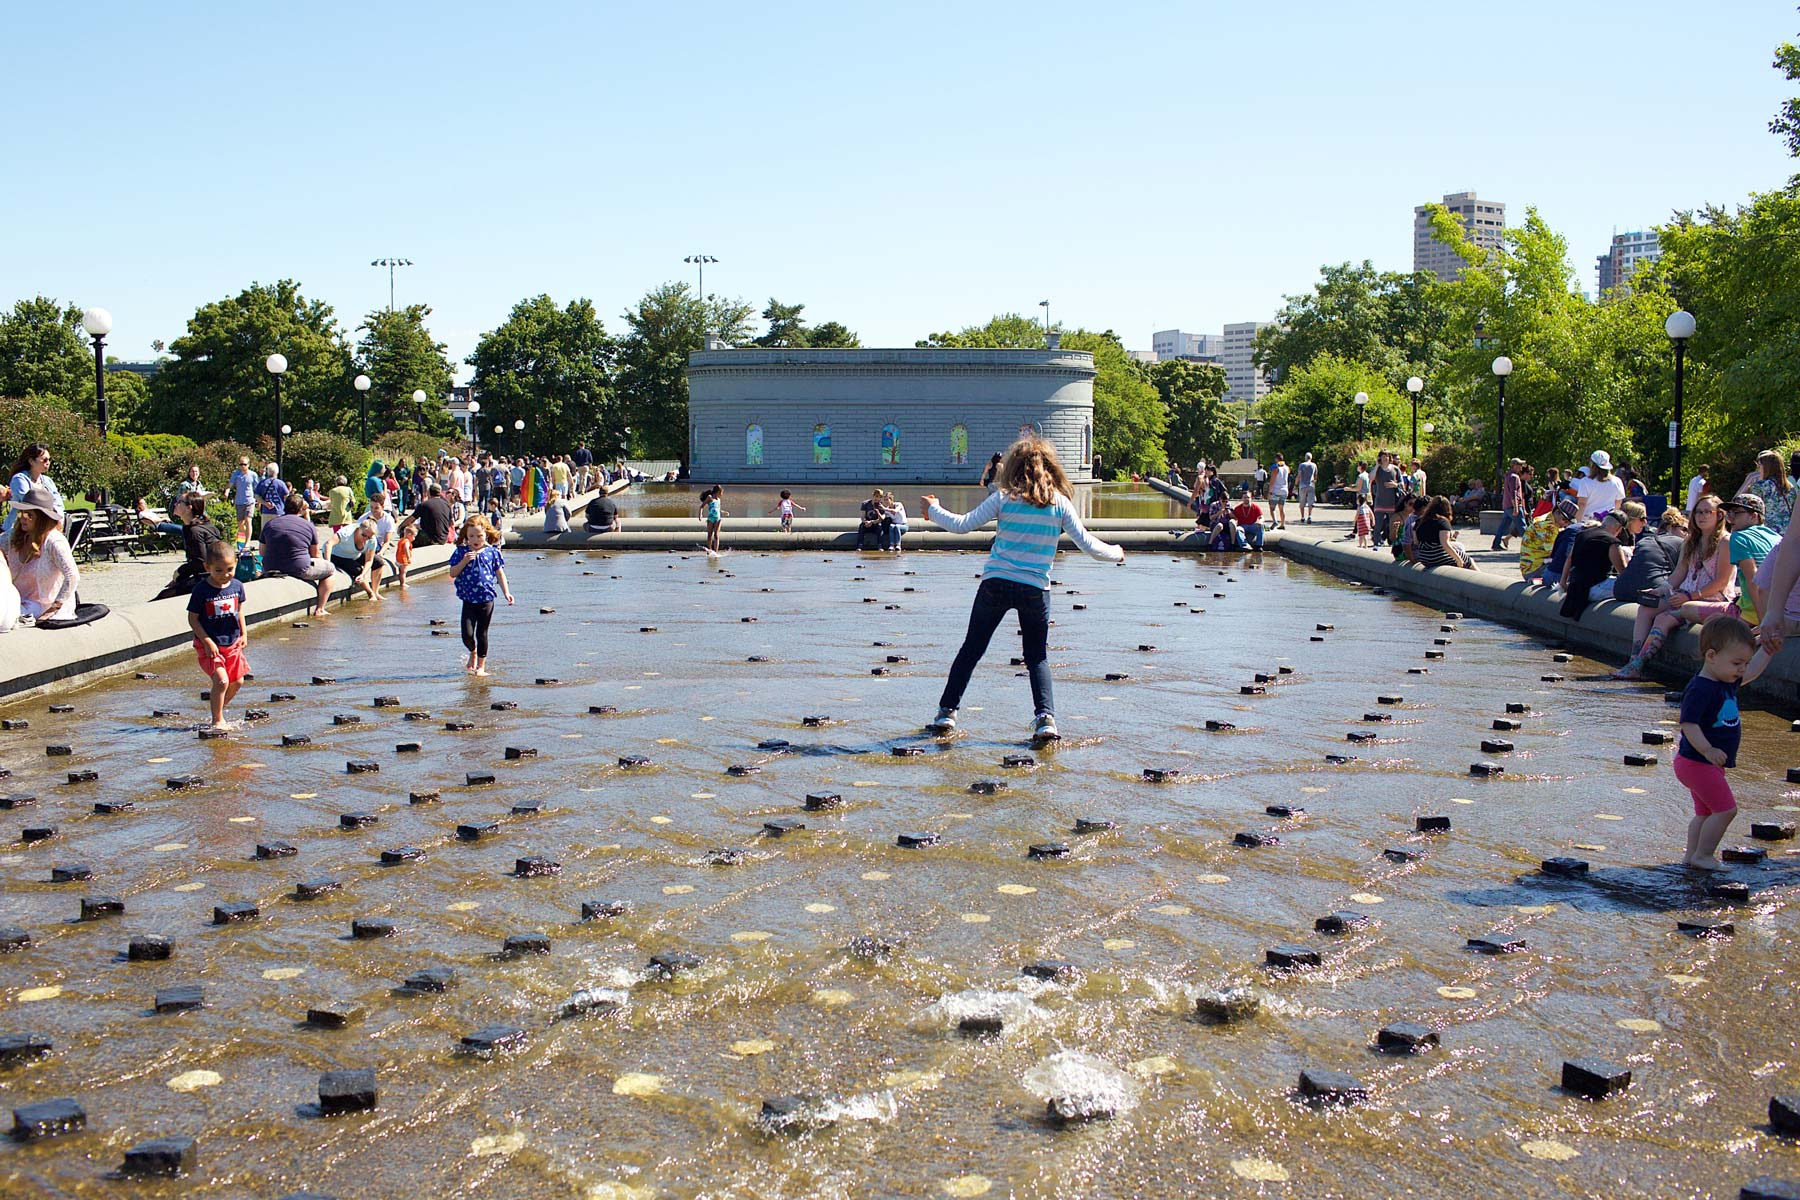 Cal Andersonin puisto sijaitsee Capitol Hillin sydämessä. (c) Alex Kampion/tripsteri.fi